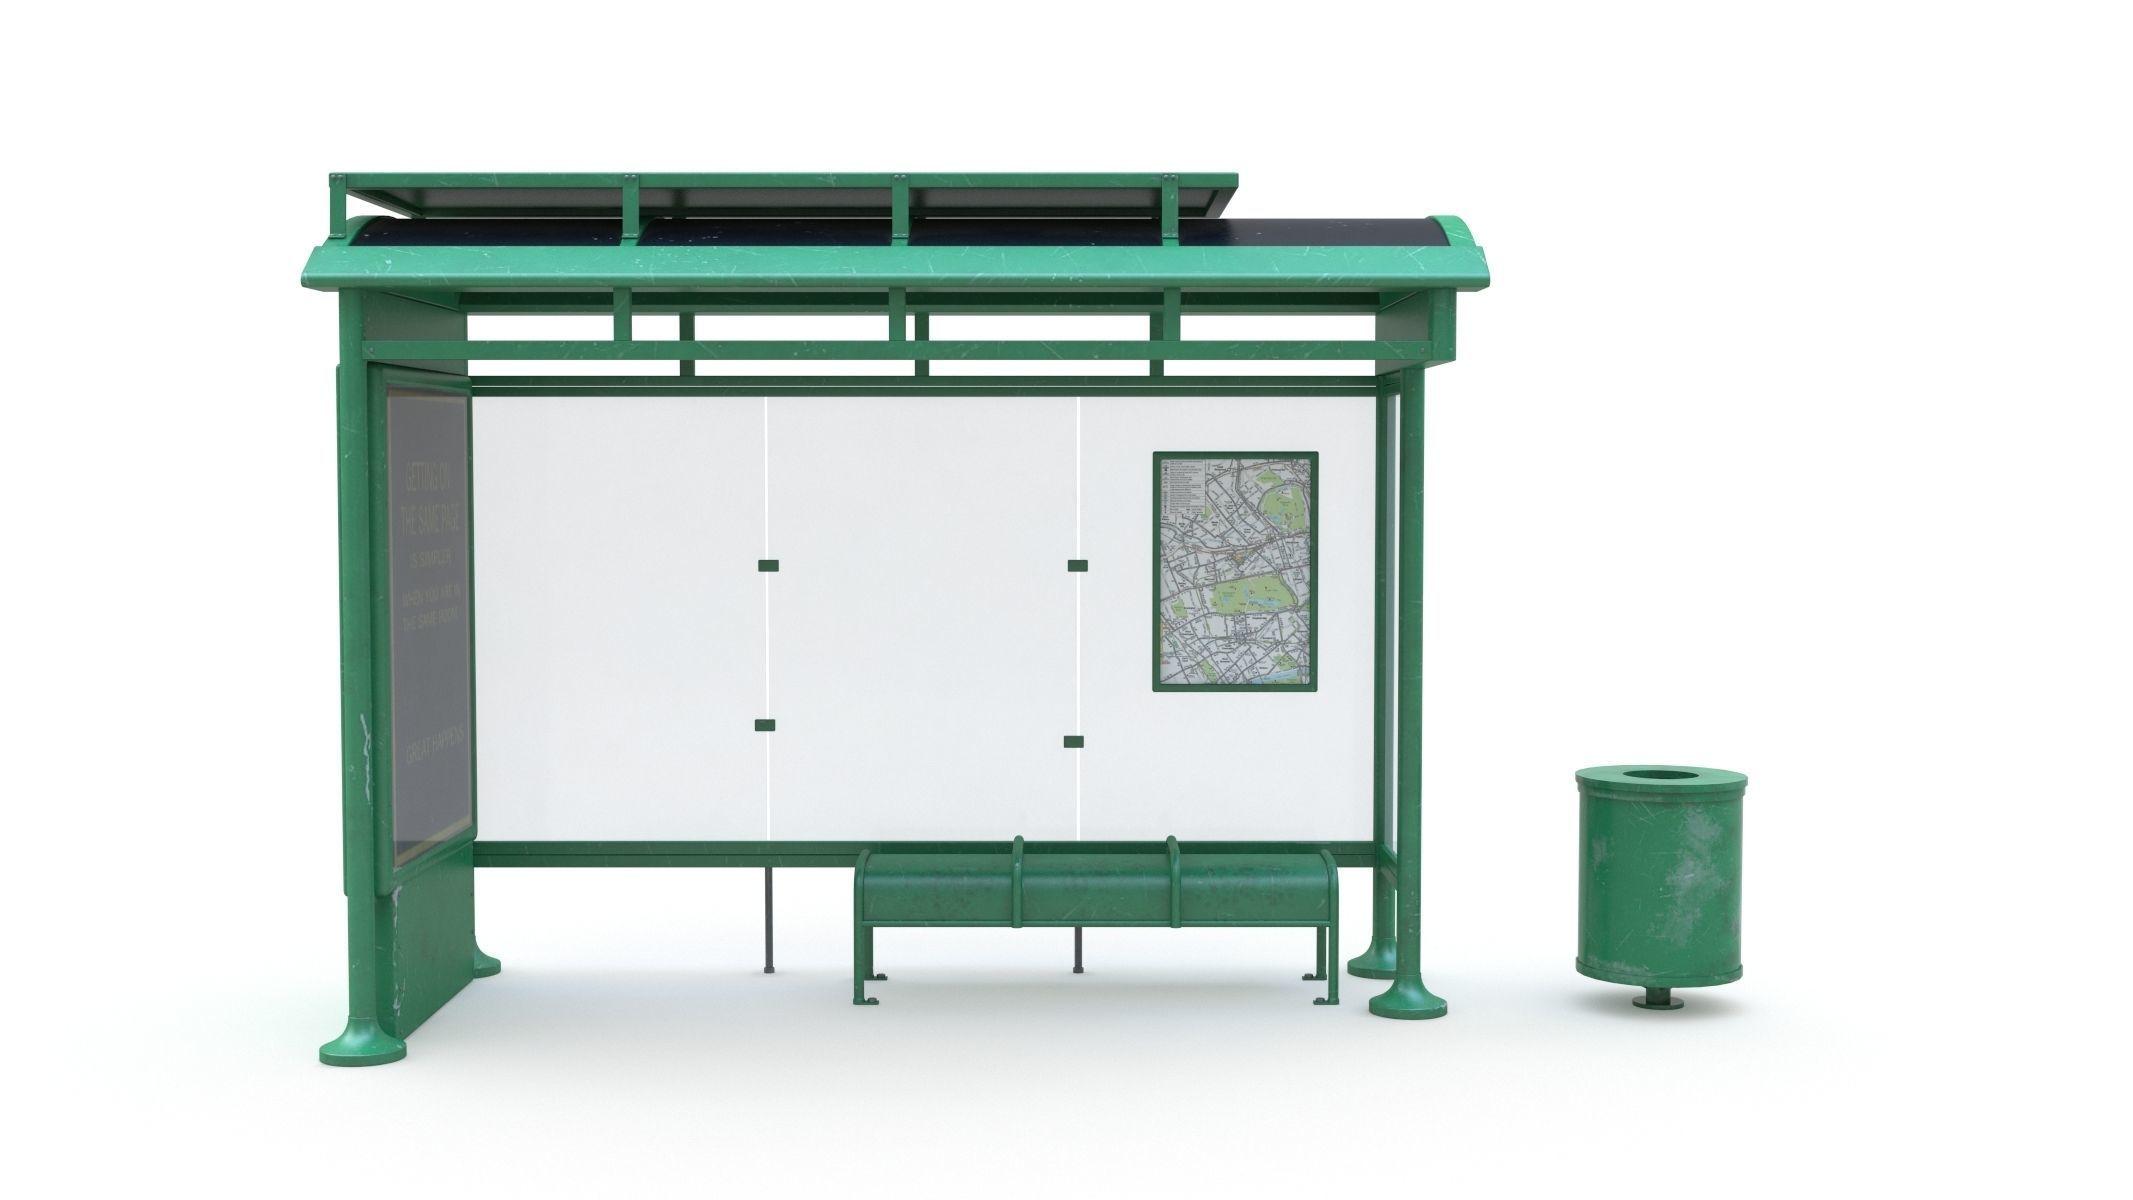 Bus Stop 04